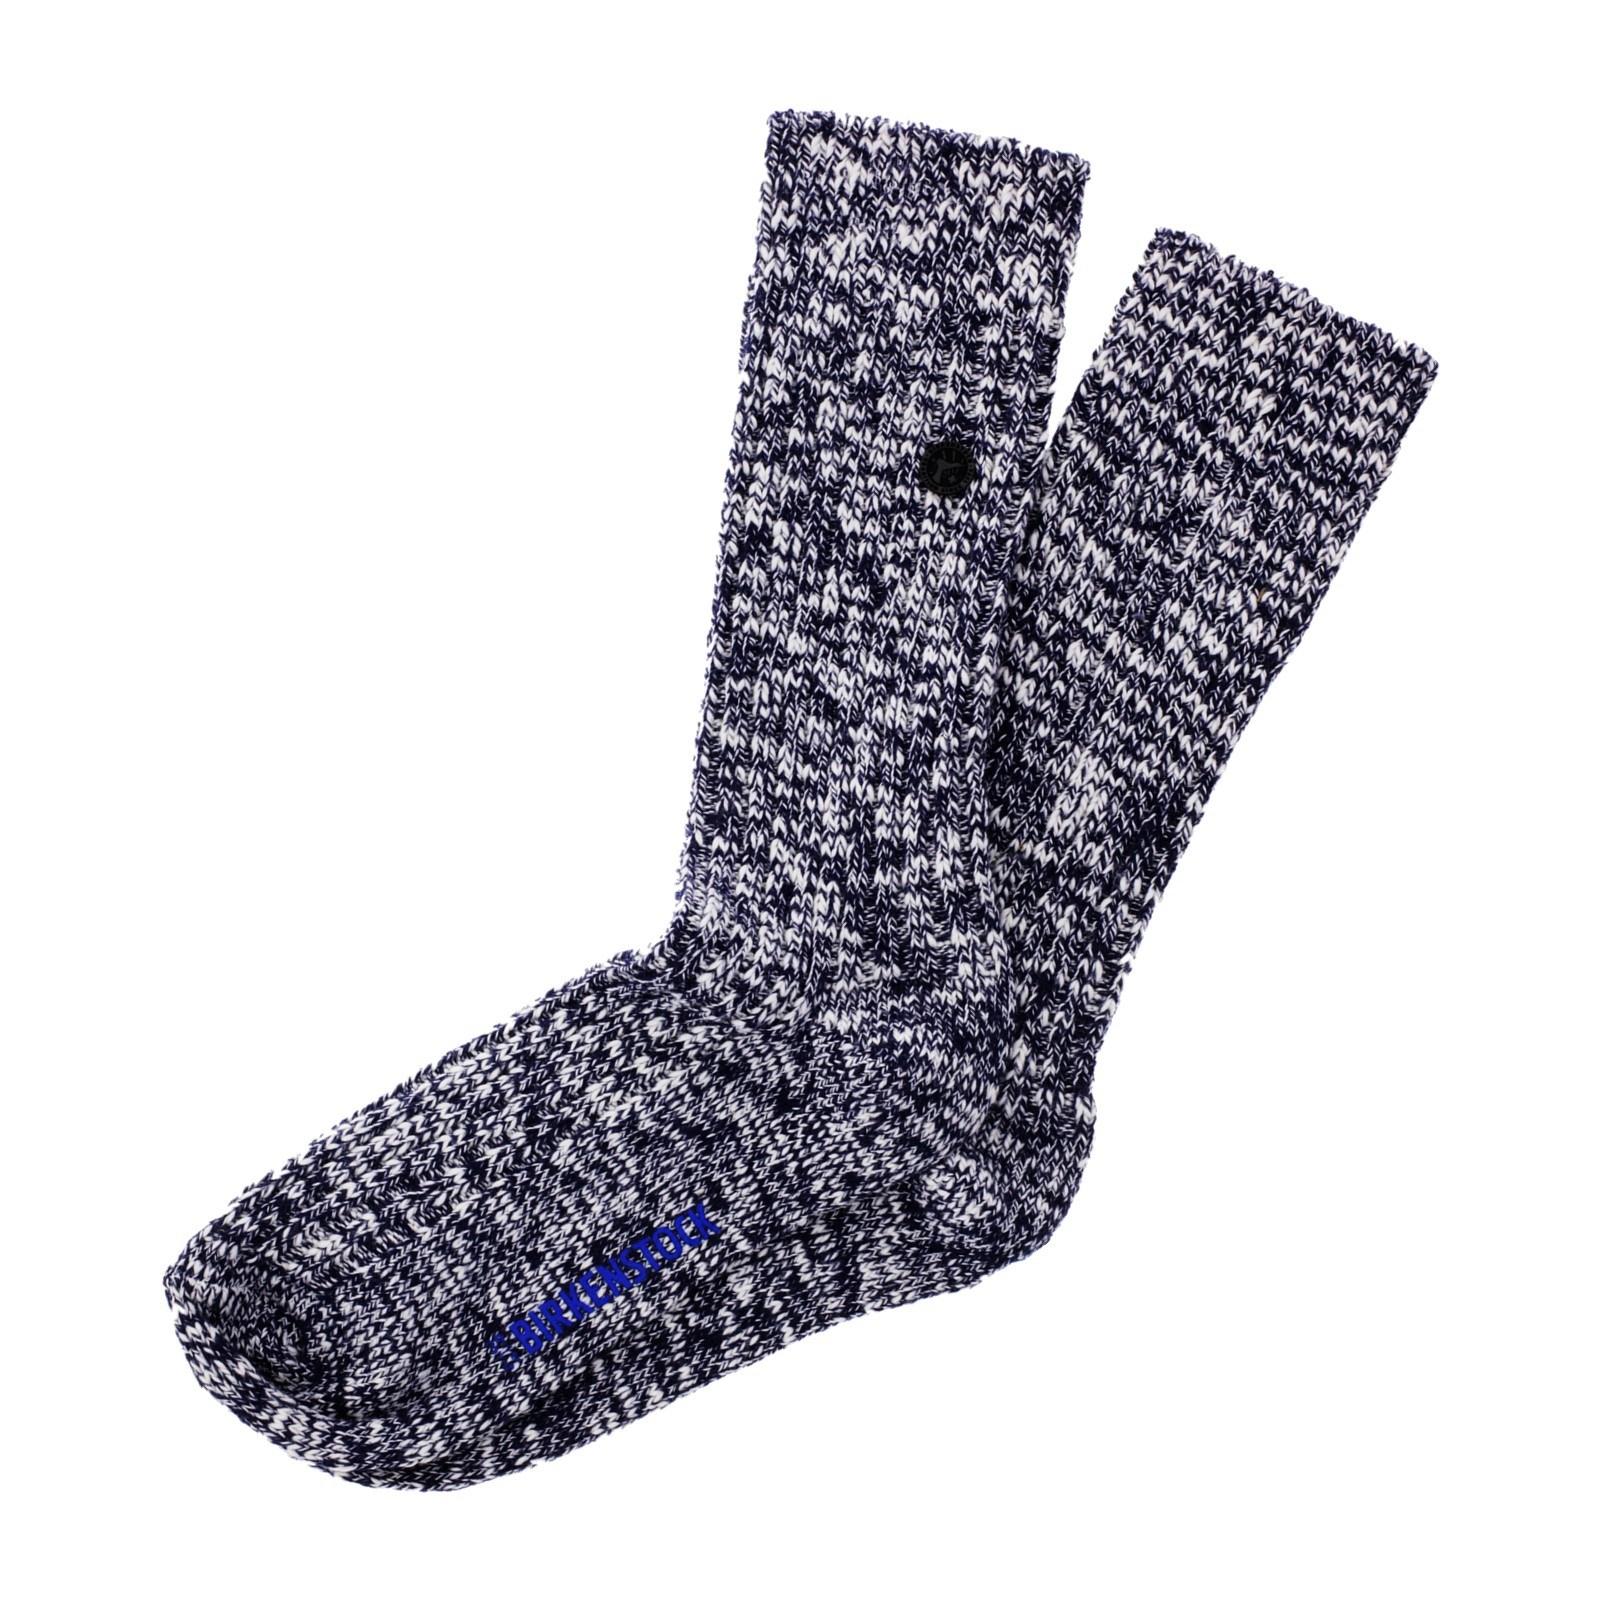 Birkenstock Herren Socken Cotton Slub Blau Weiß Meliert